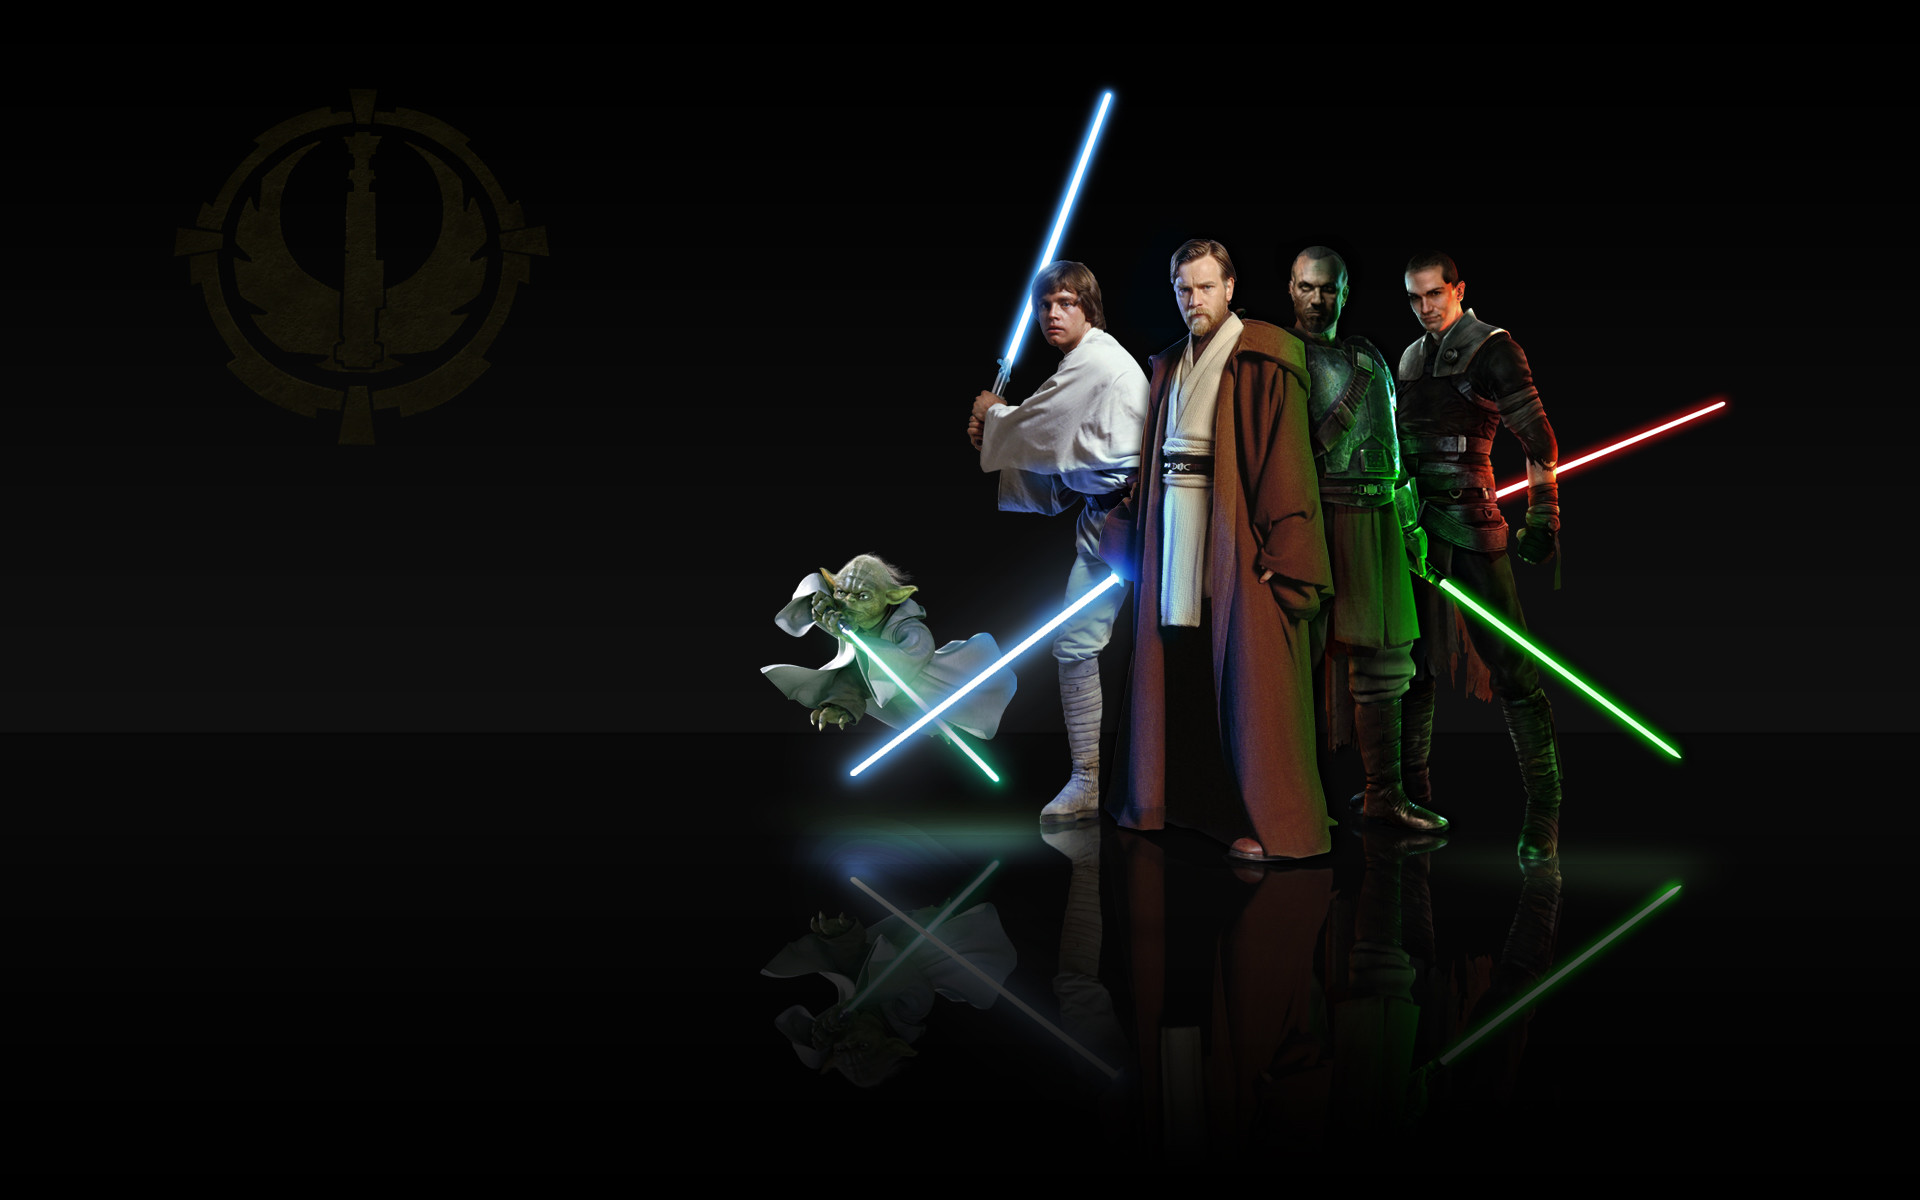 Star Wars   Star wars Wallpaper Image HD Wallpapers Free Movie